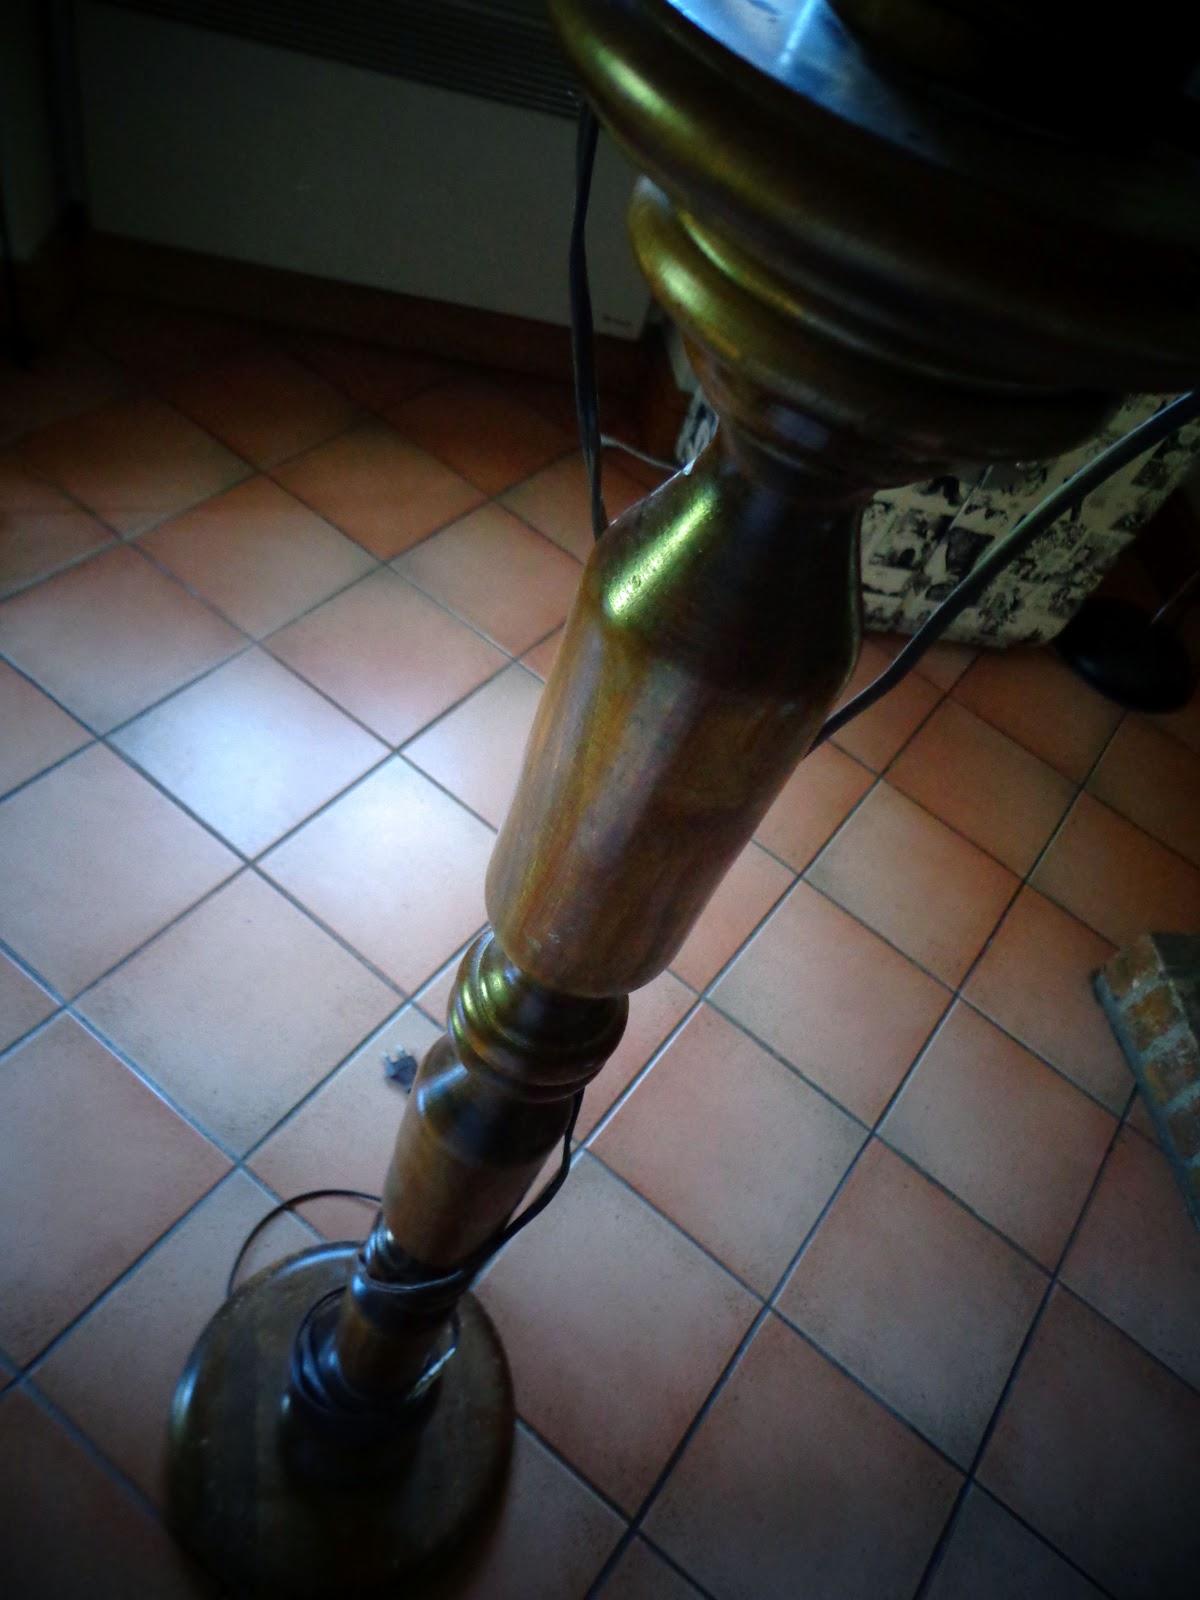 faut il tre une lumi re pour relooker un lampadaire la fibre cr ative. Black Bedroom Furniture Sets. Home Design Ideas